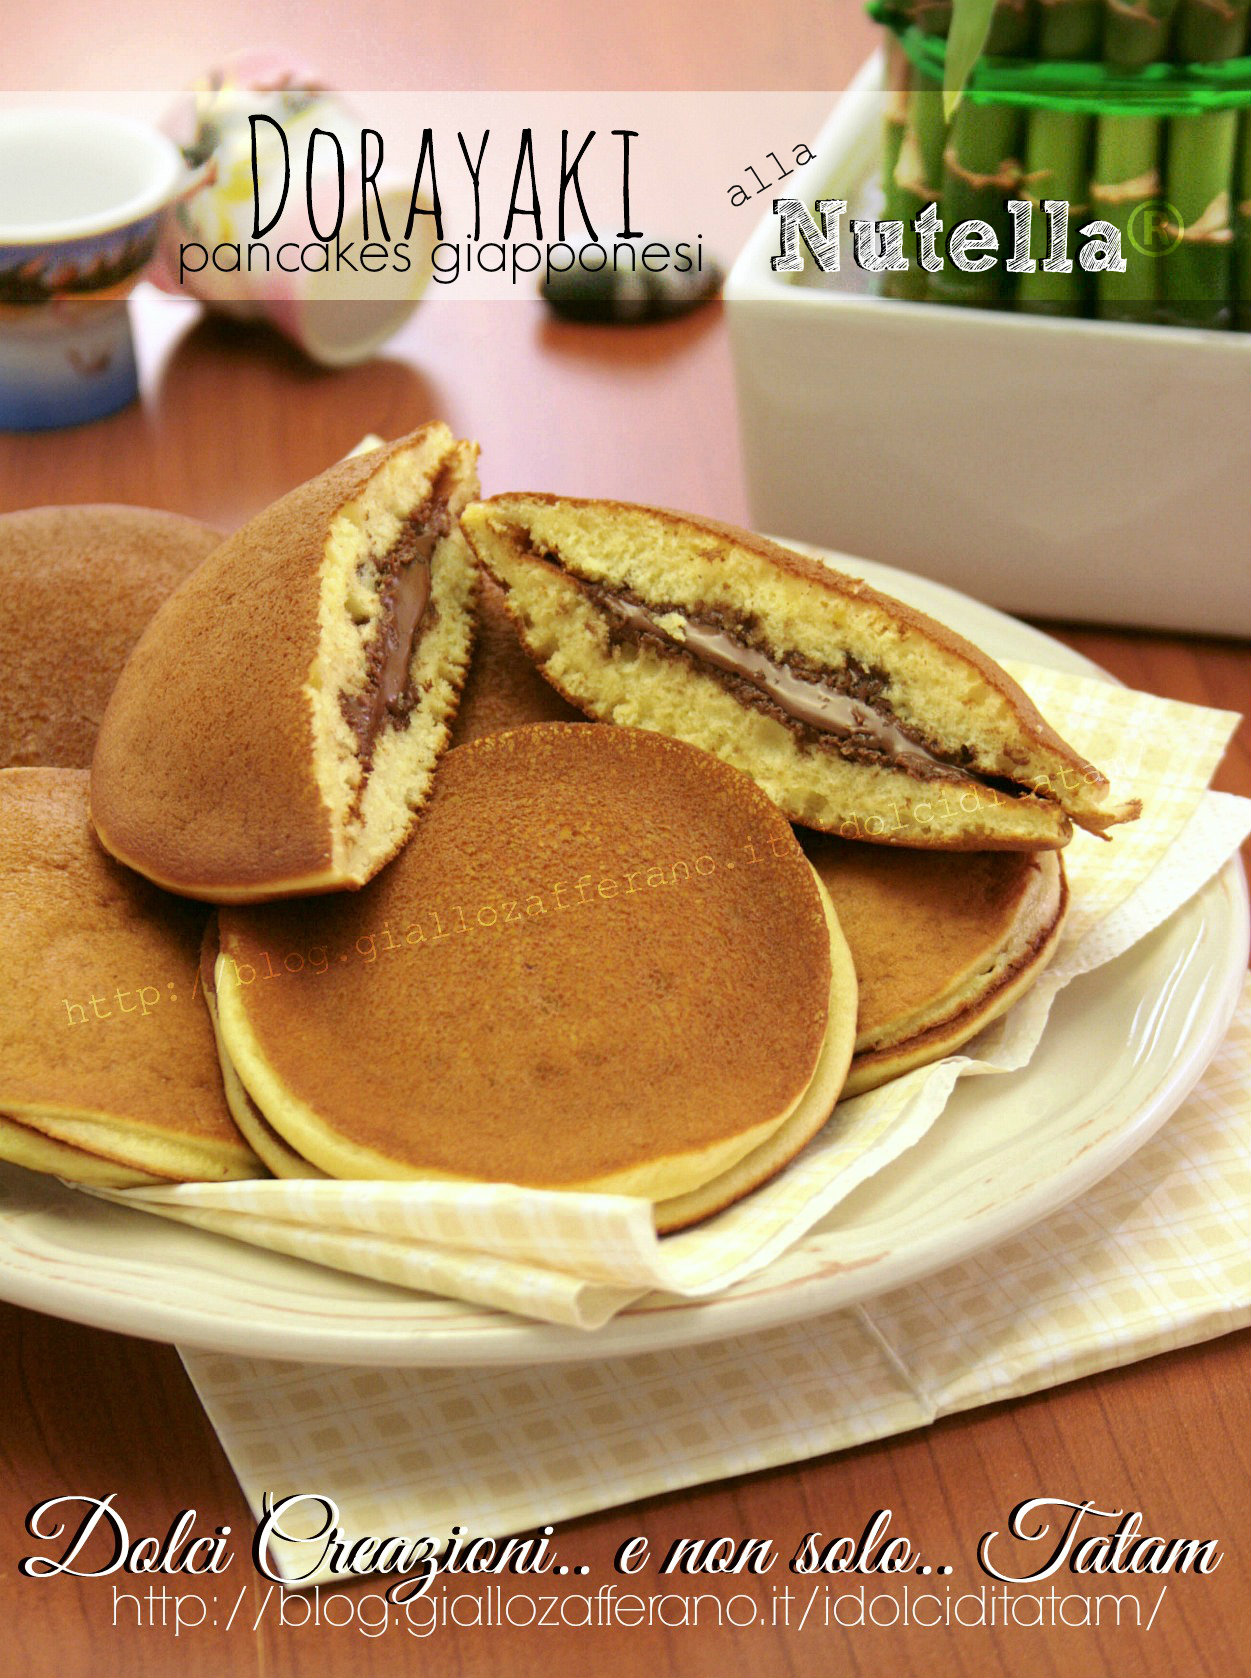 Dorayaki pancakes giapponesi alla Nutella